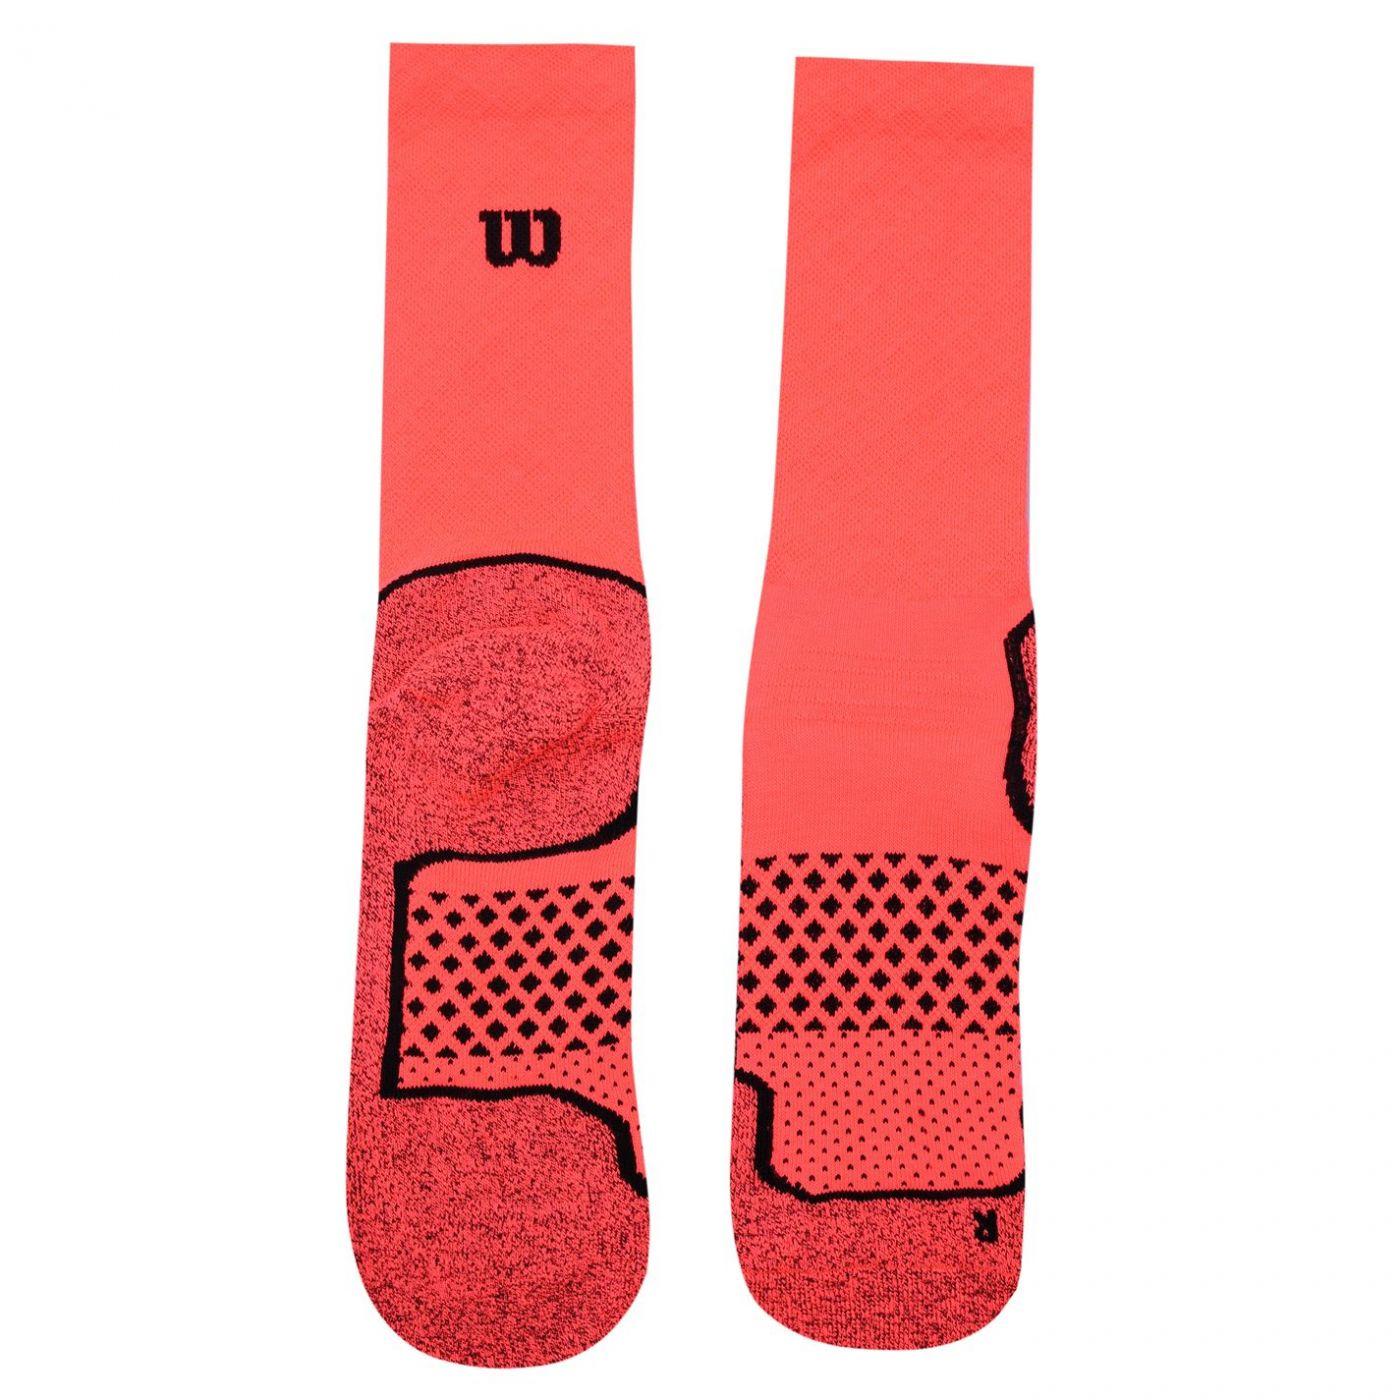 Wilson Amplif Sock Ld99